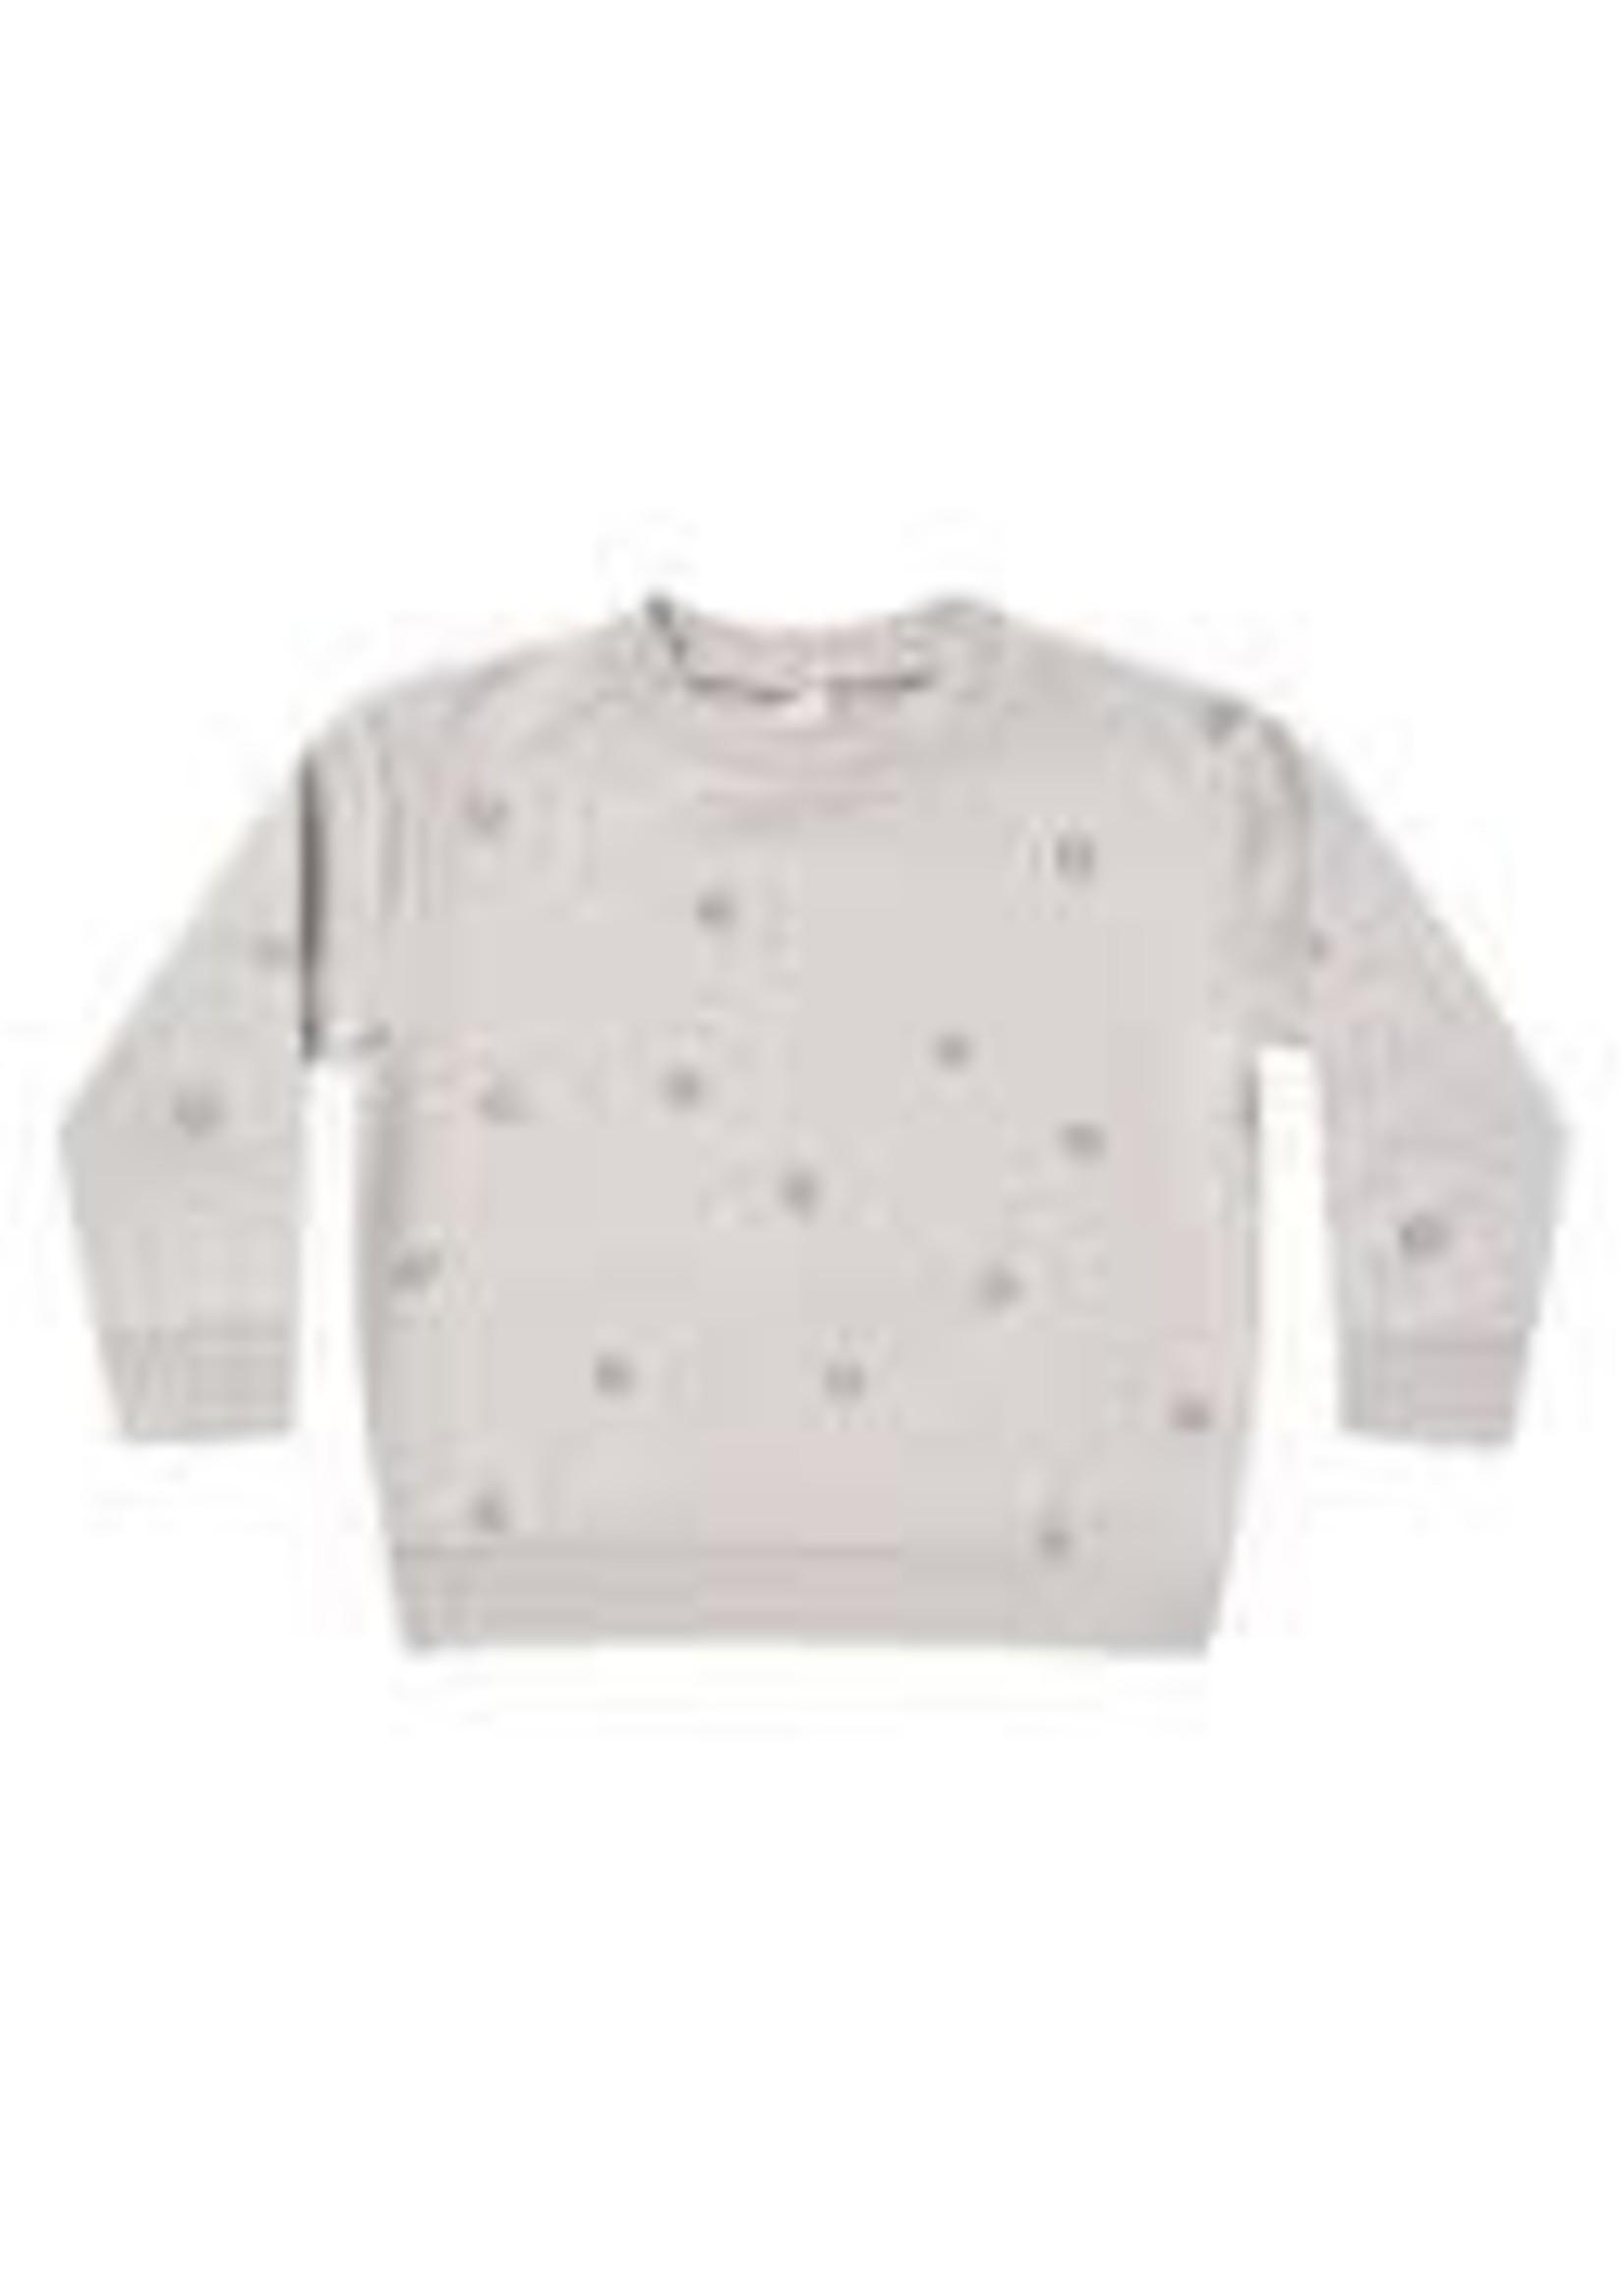 Quincy Mae Quincy Mae - Fleece Sweatshirt